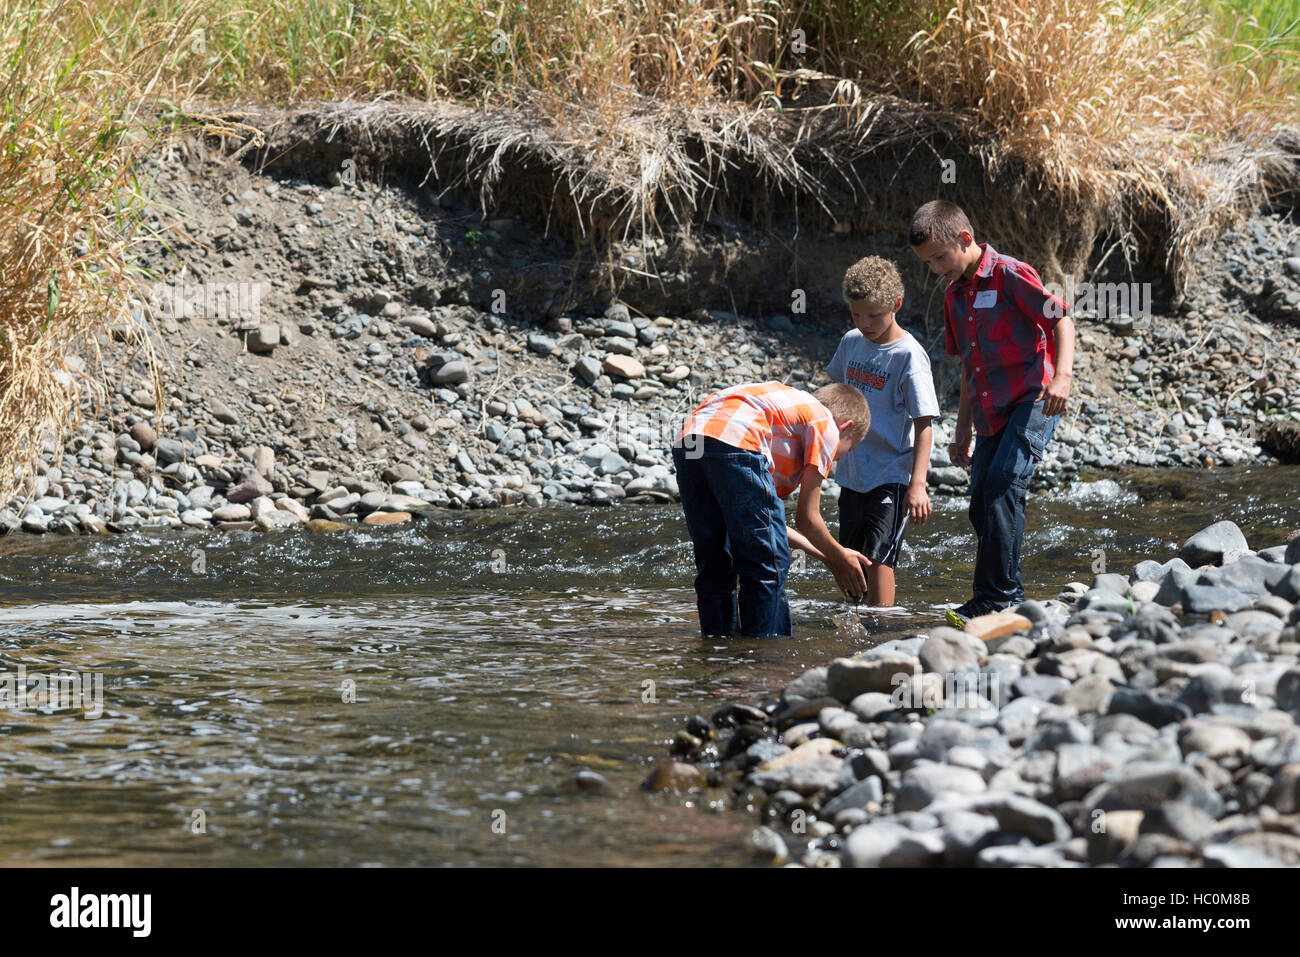 Kids exploring a river in Northeast Oregon. - Stock Image